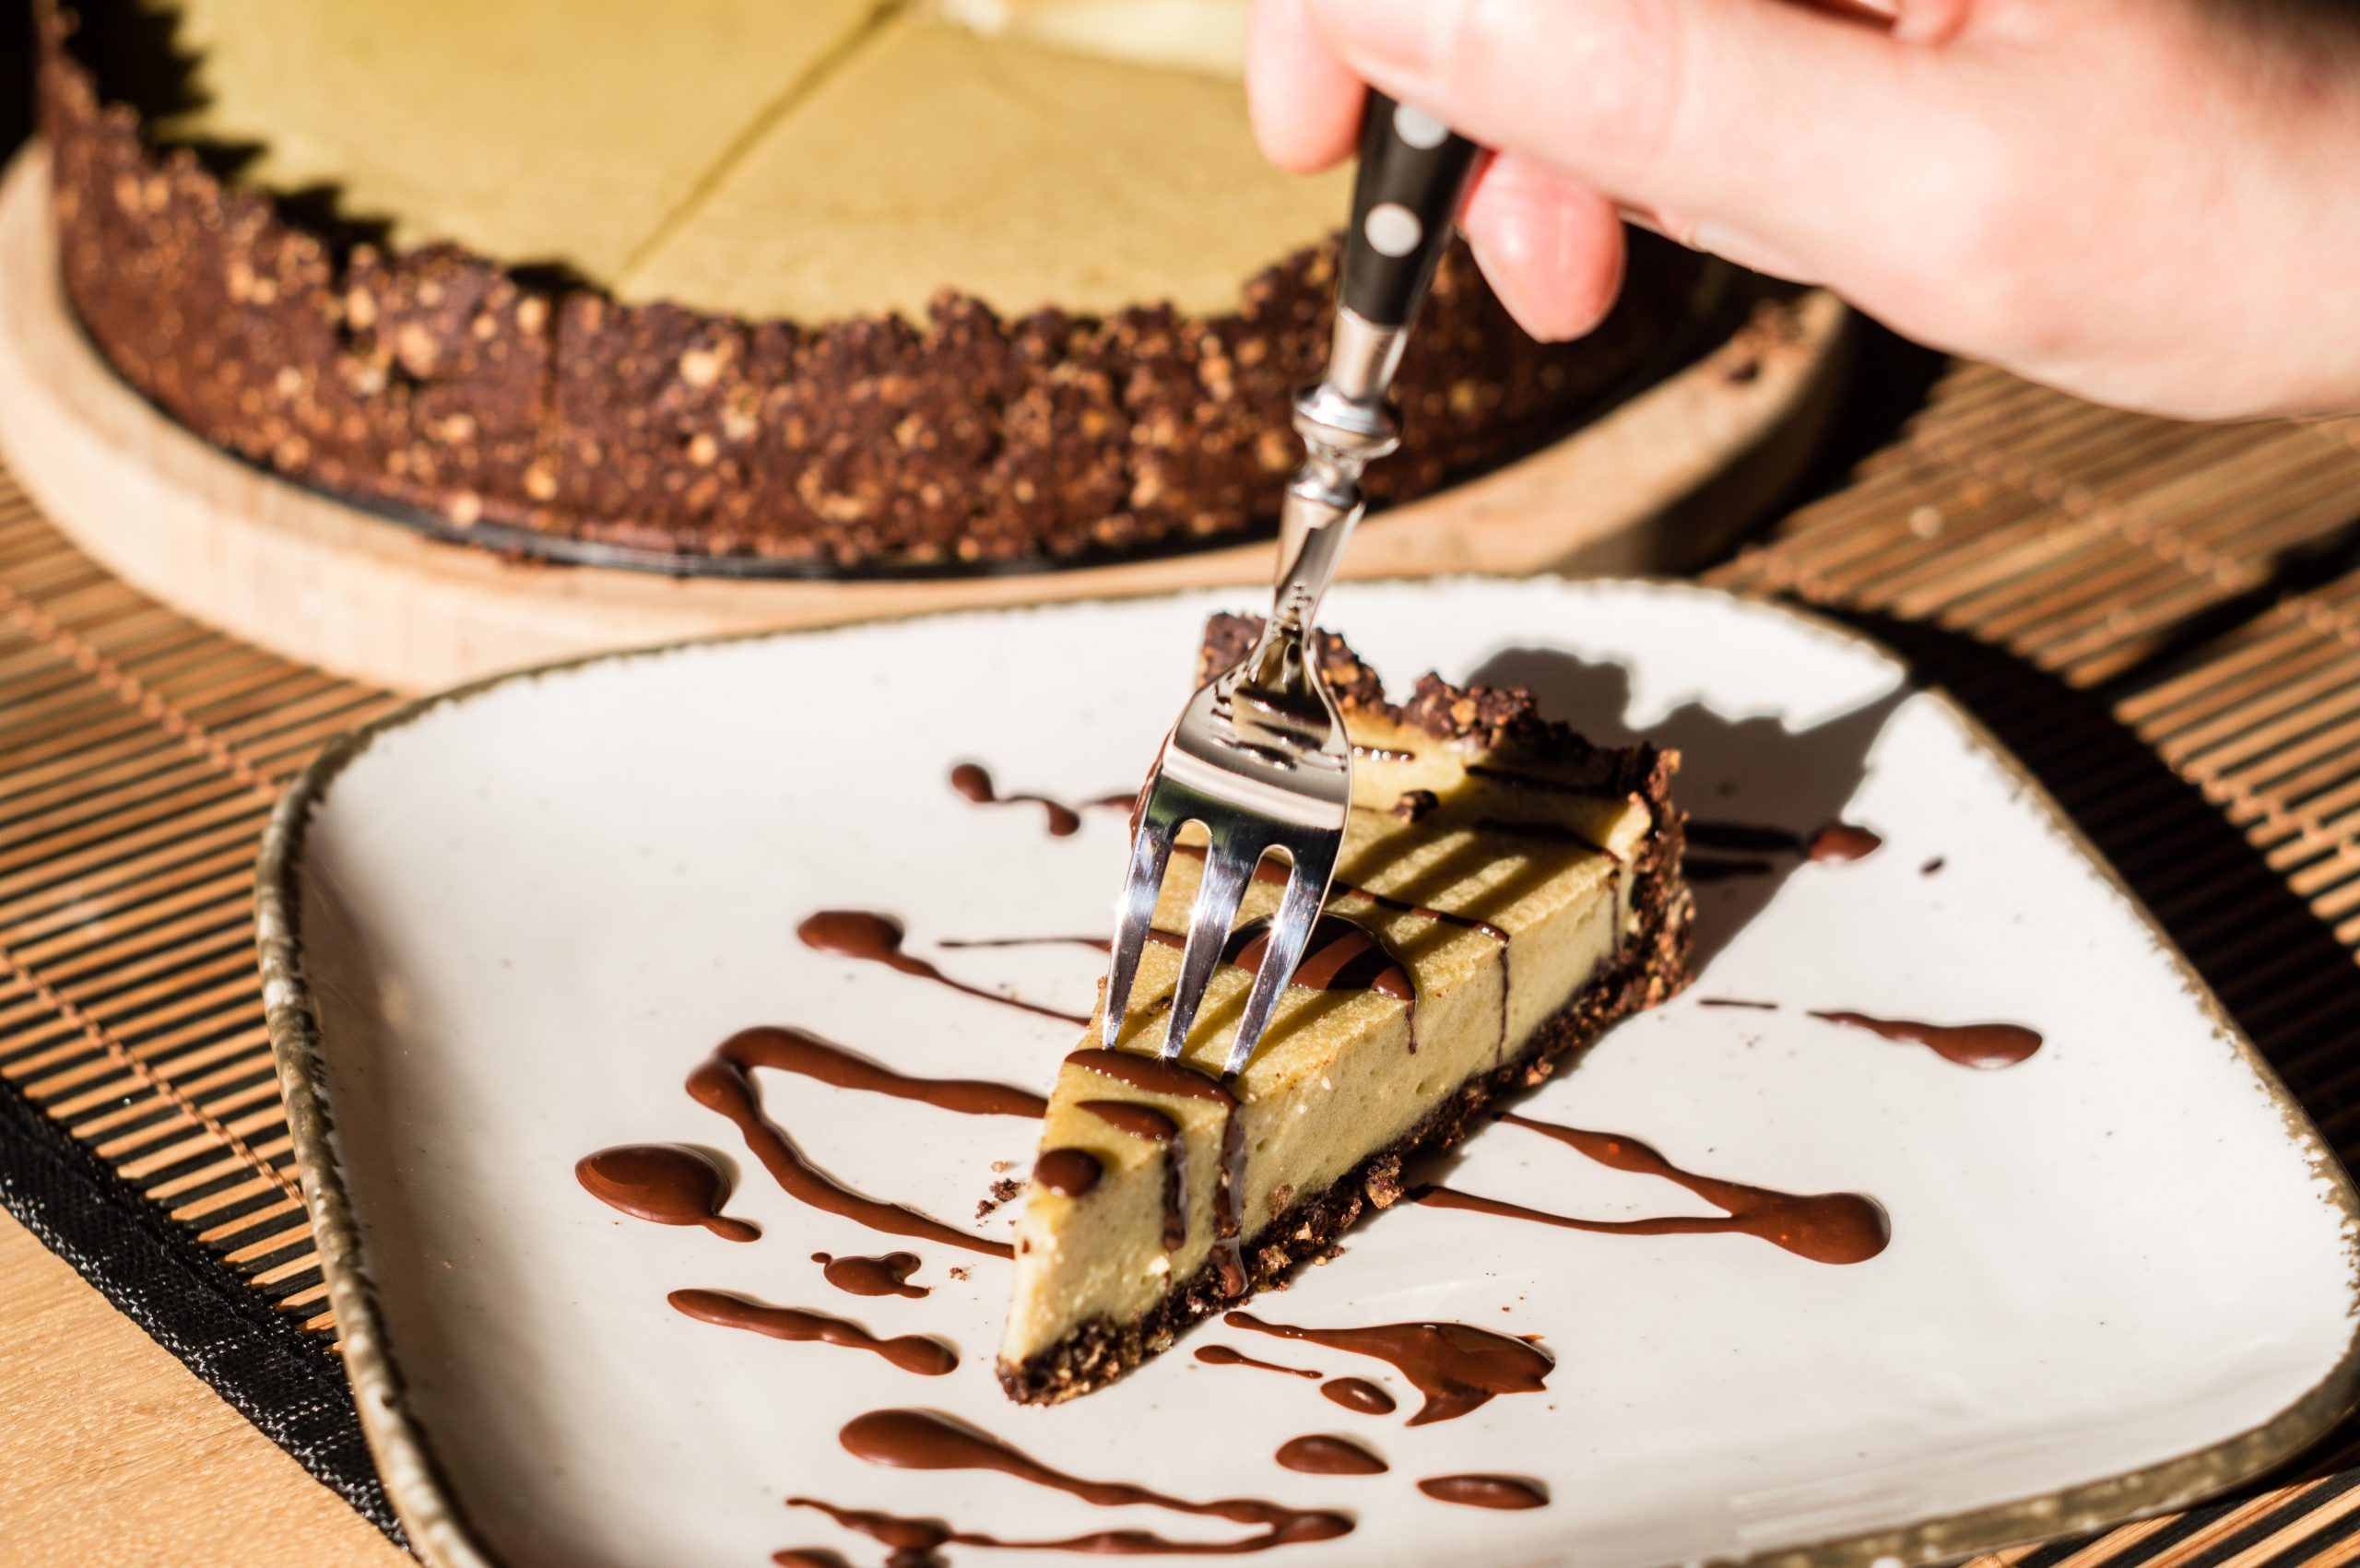 Veganer After-Eight-Käsekuchen mit geschmolzener Zartbitterschokolade